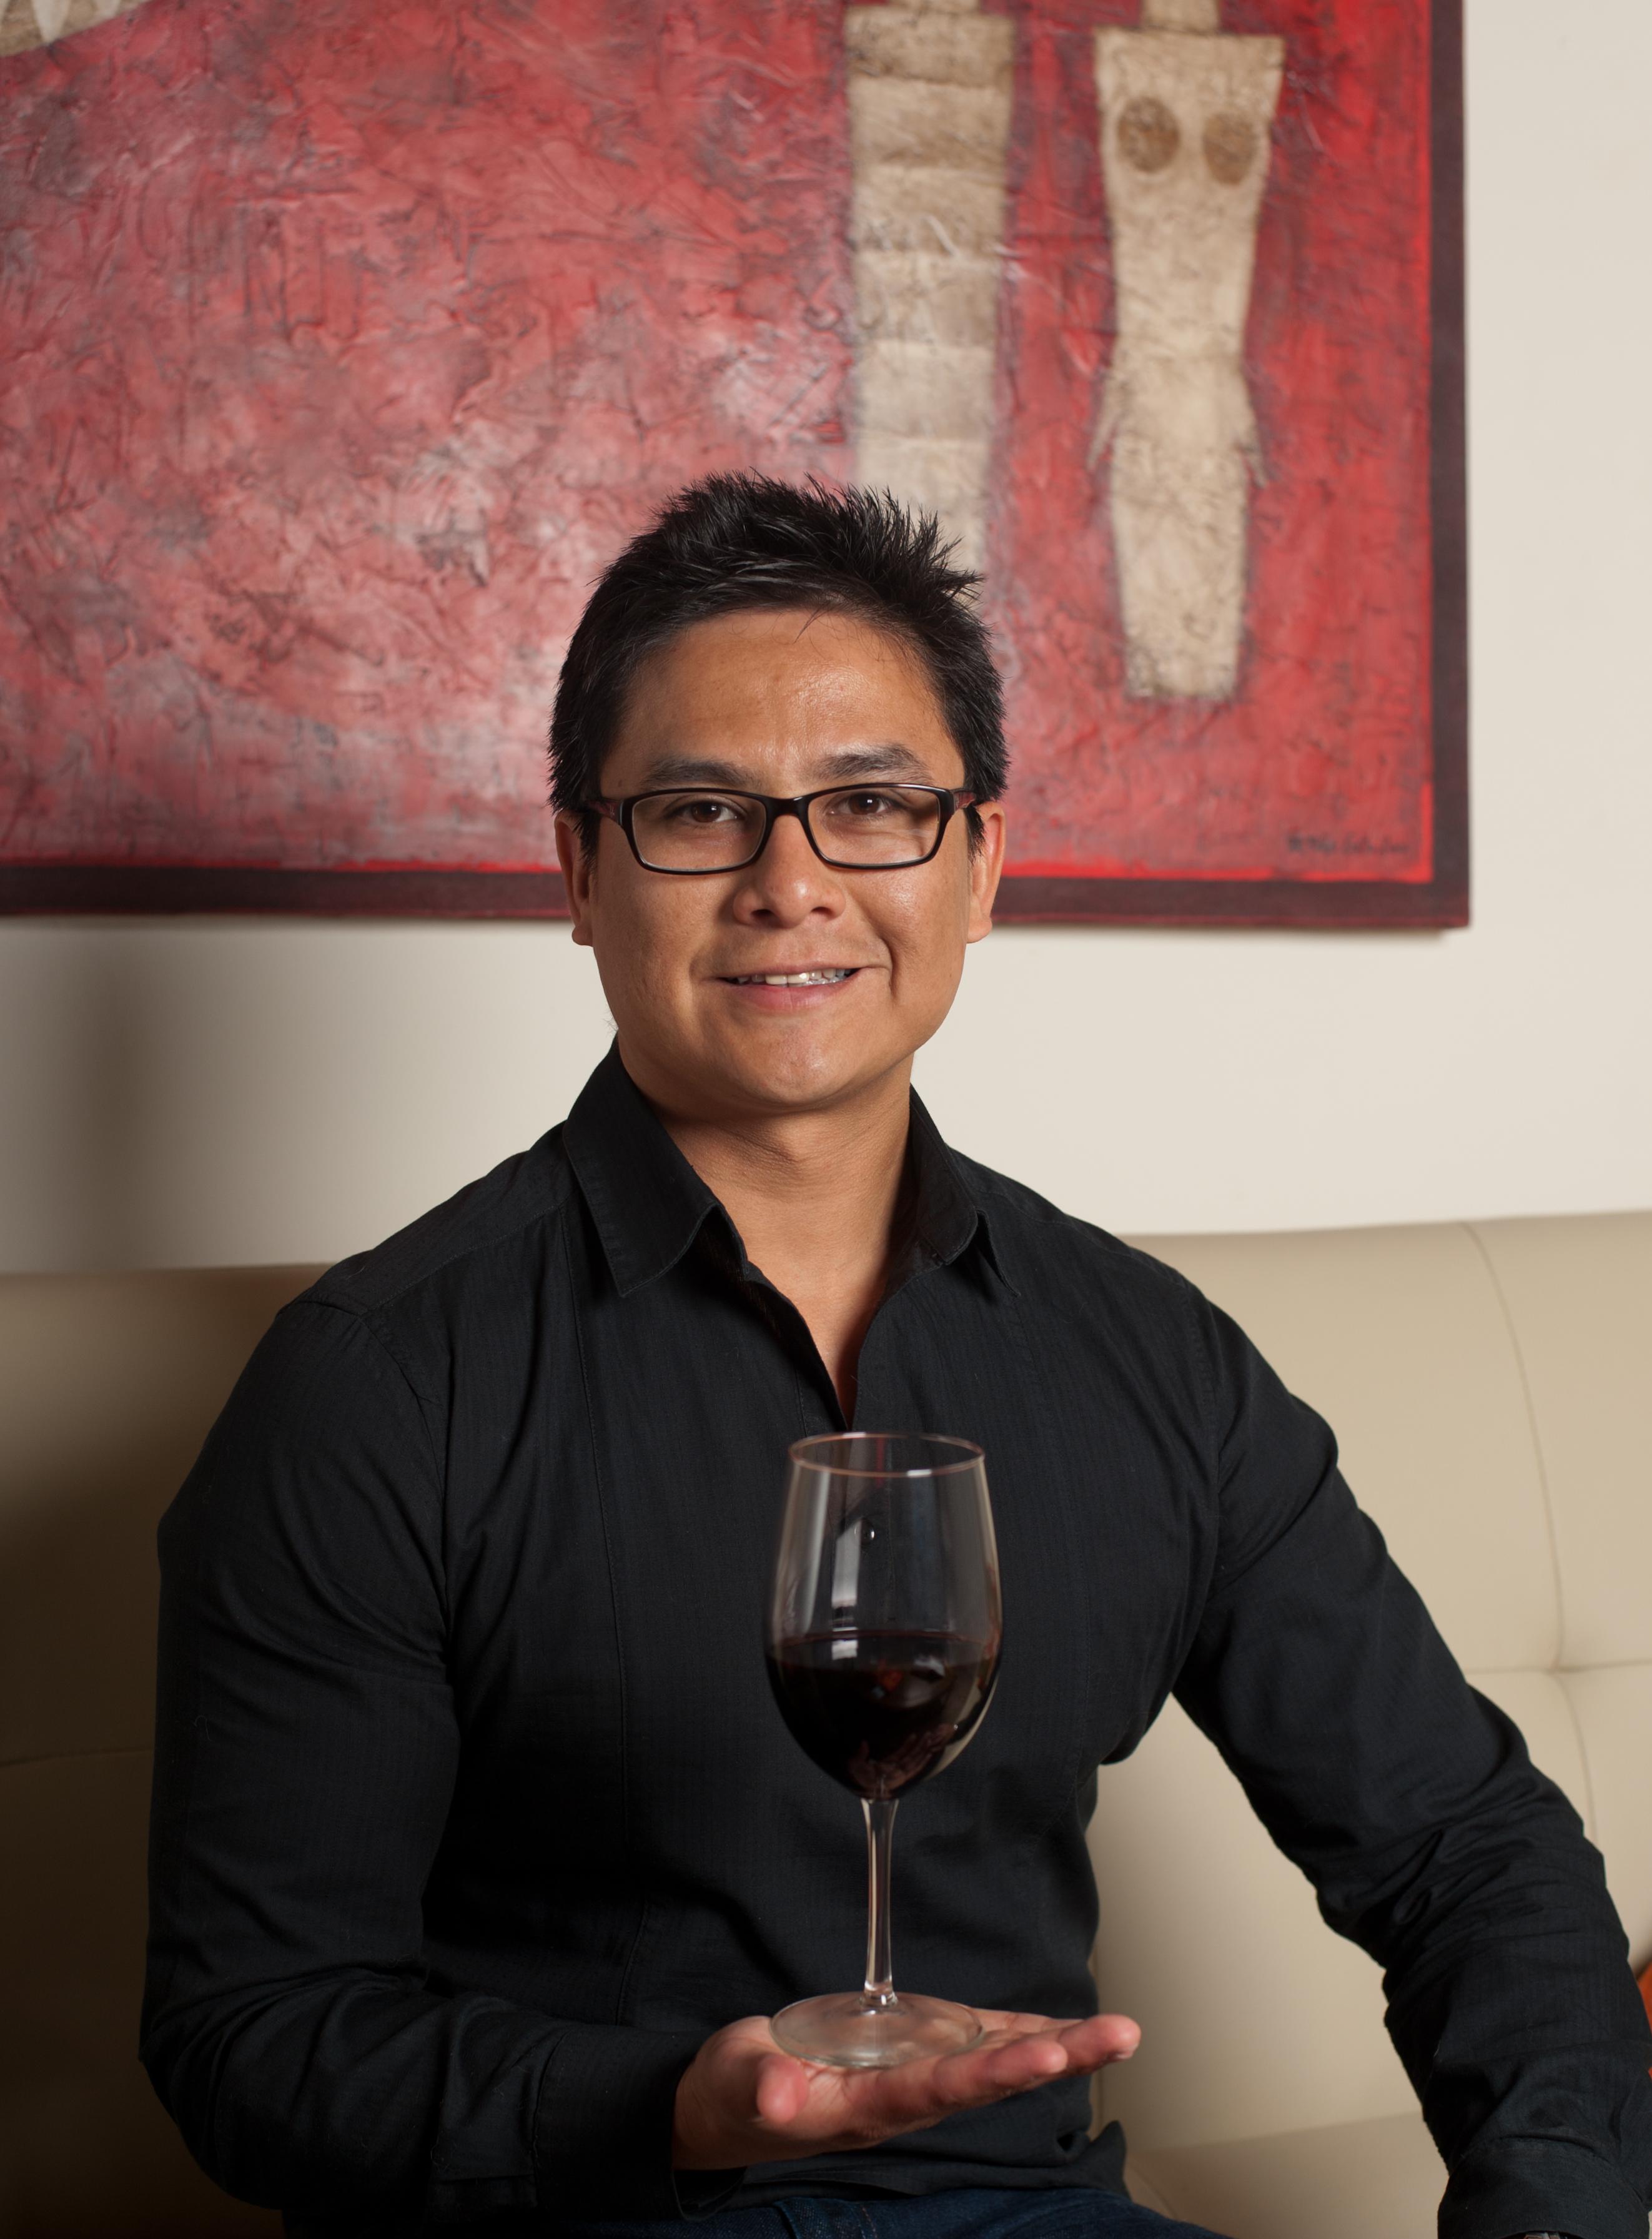 UC Davis-trained wine educator featured at Winestock SF